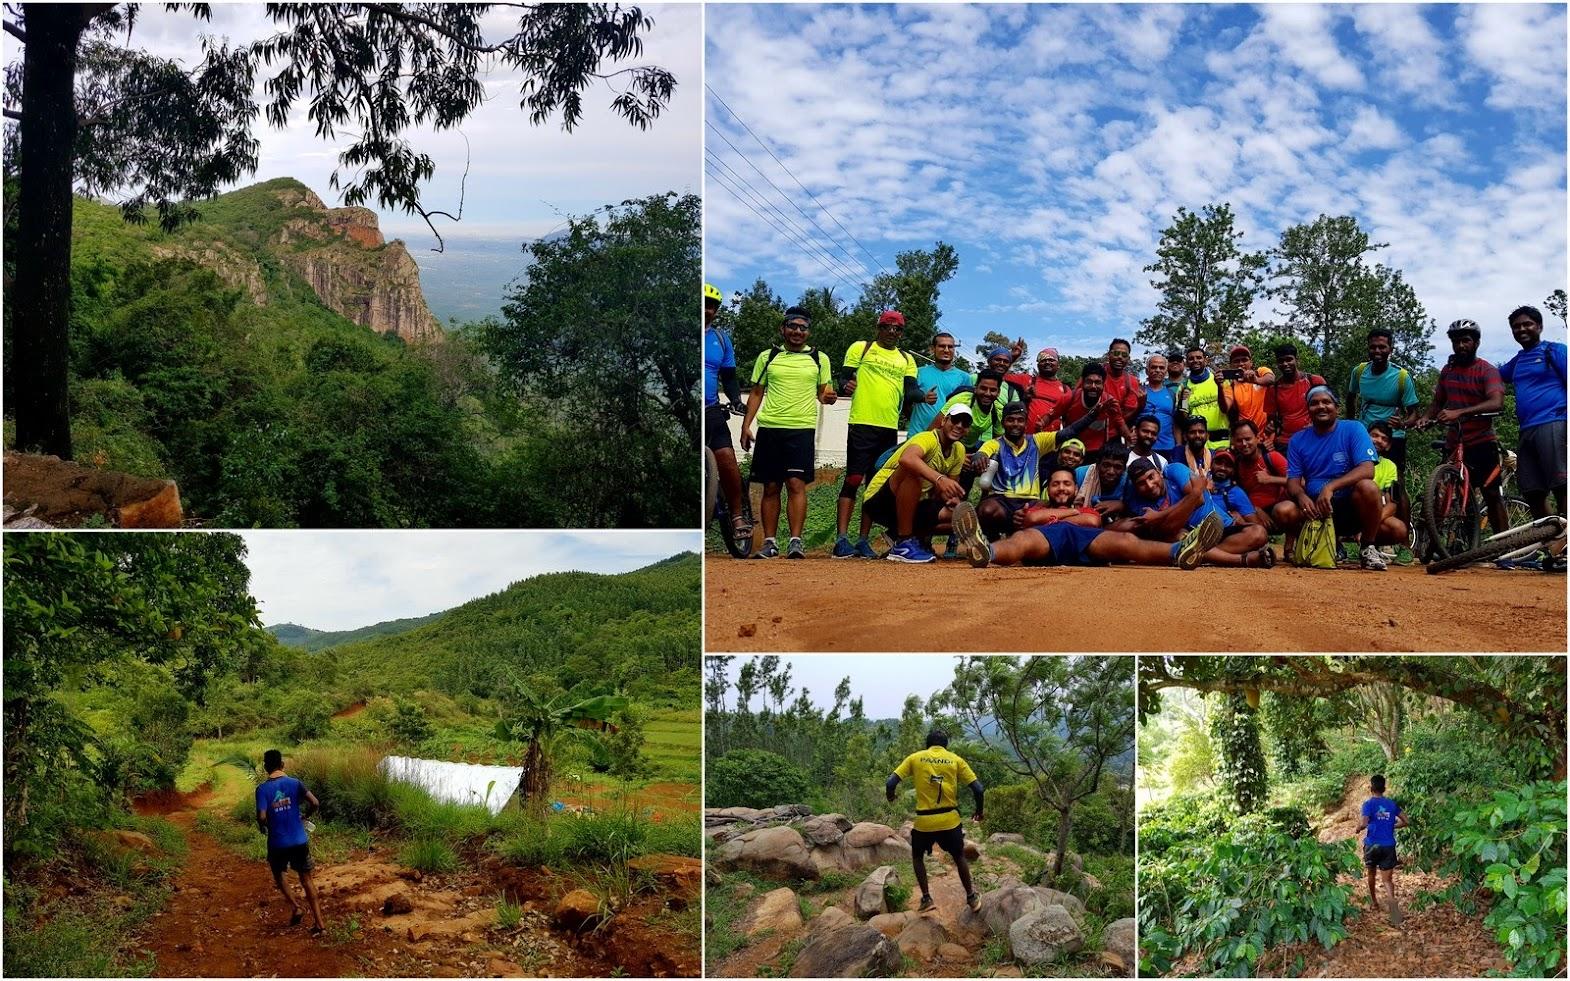 The Chennai Trekking Club